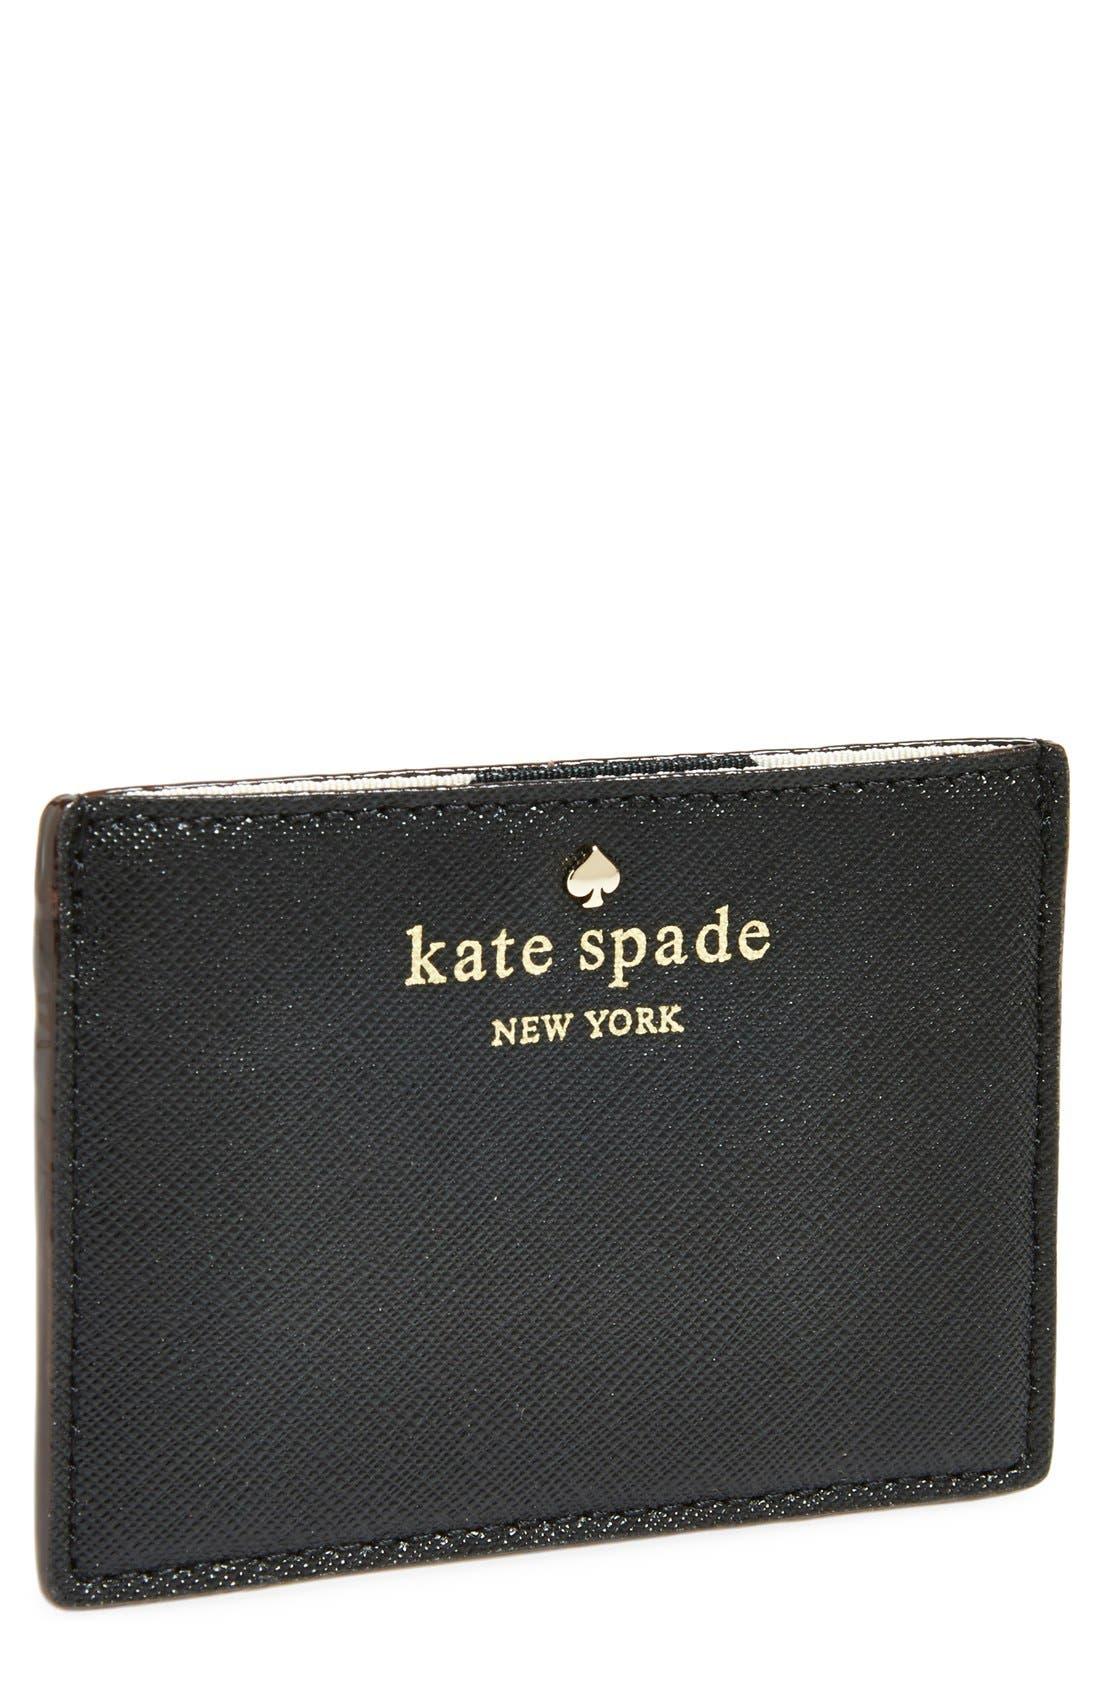 kate spade new york  u0026 39 cedar street u0026 39  card holder